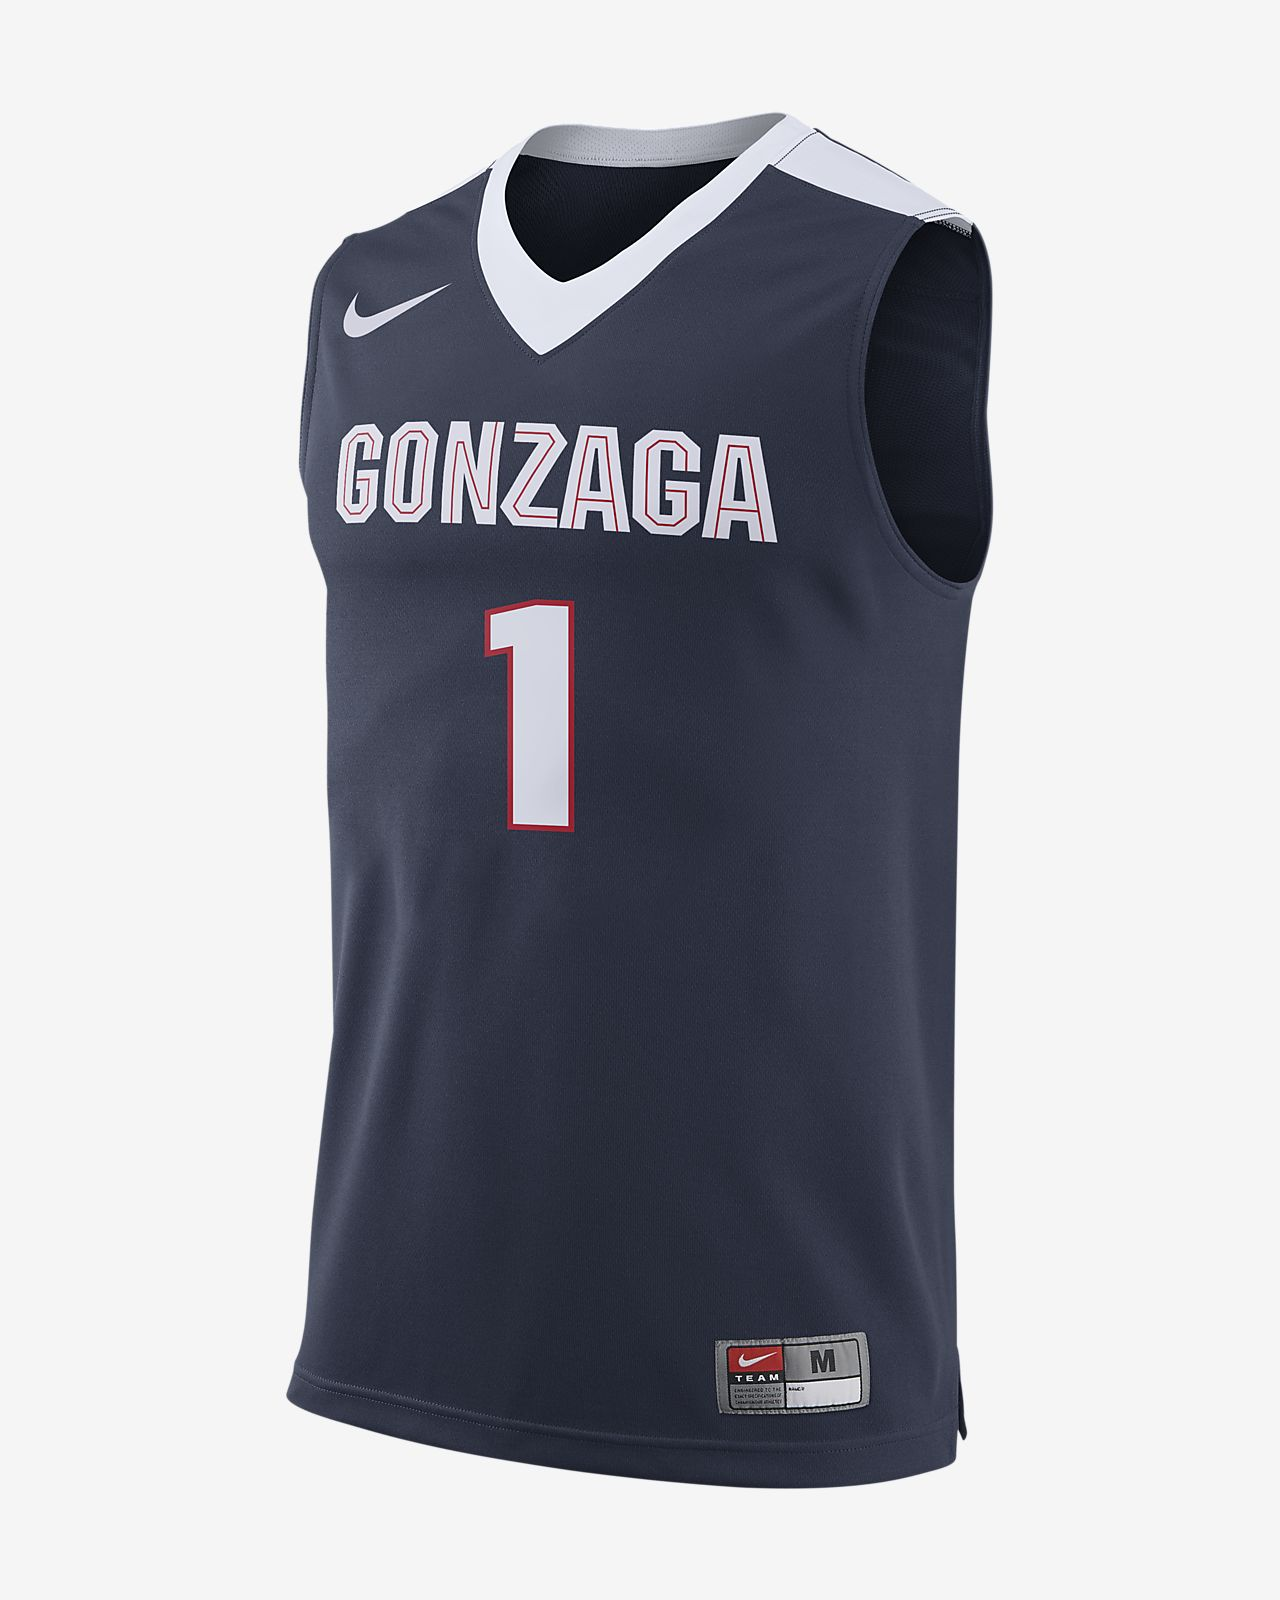 half off b6b27 f628d Nike College Replica (Gonzaga) Men's Basketball Jersey